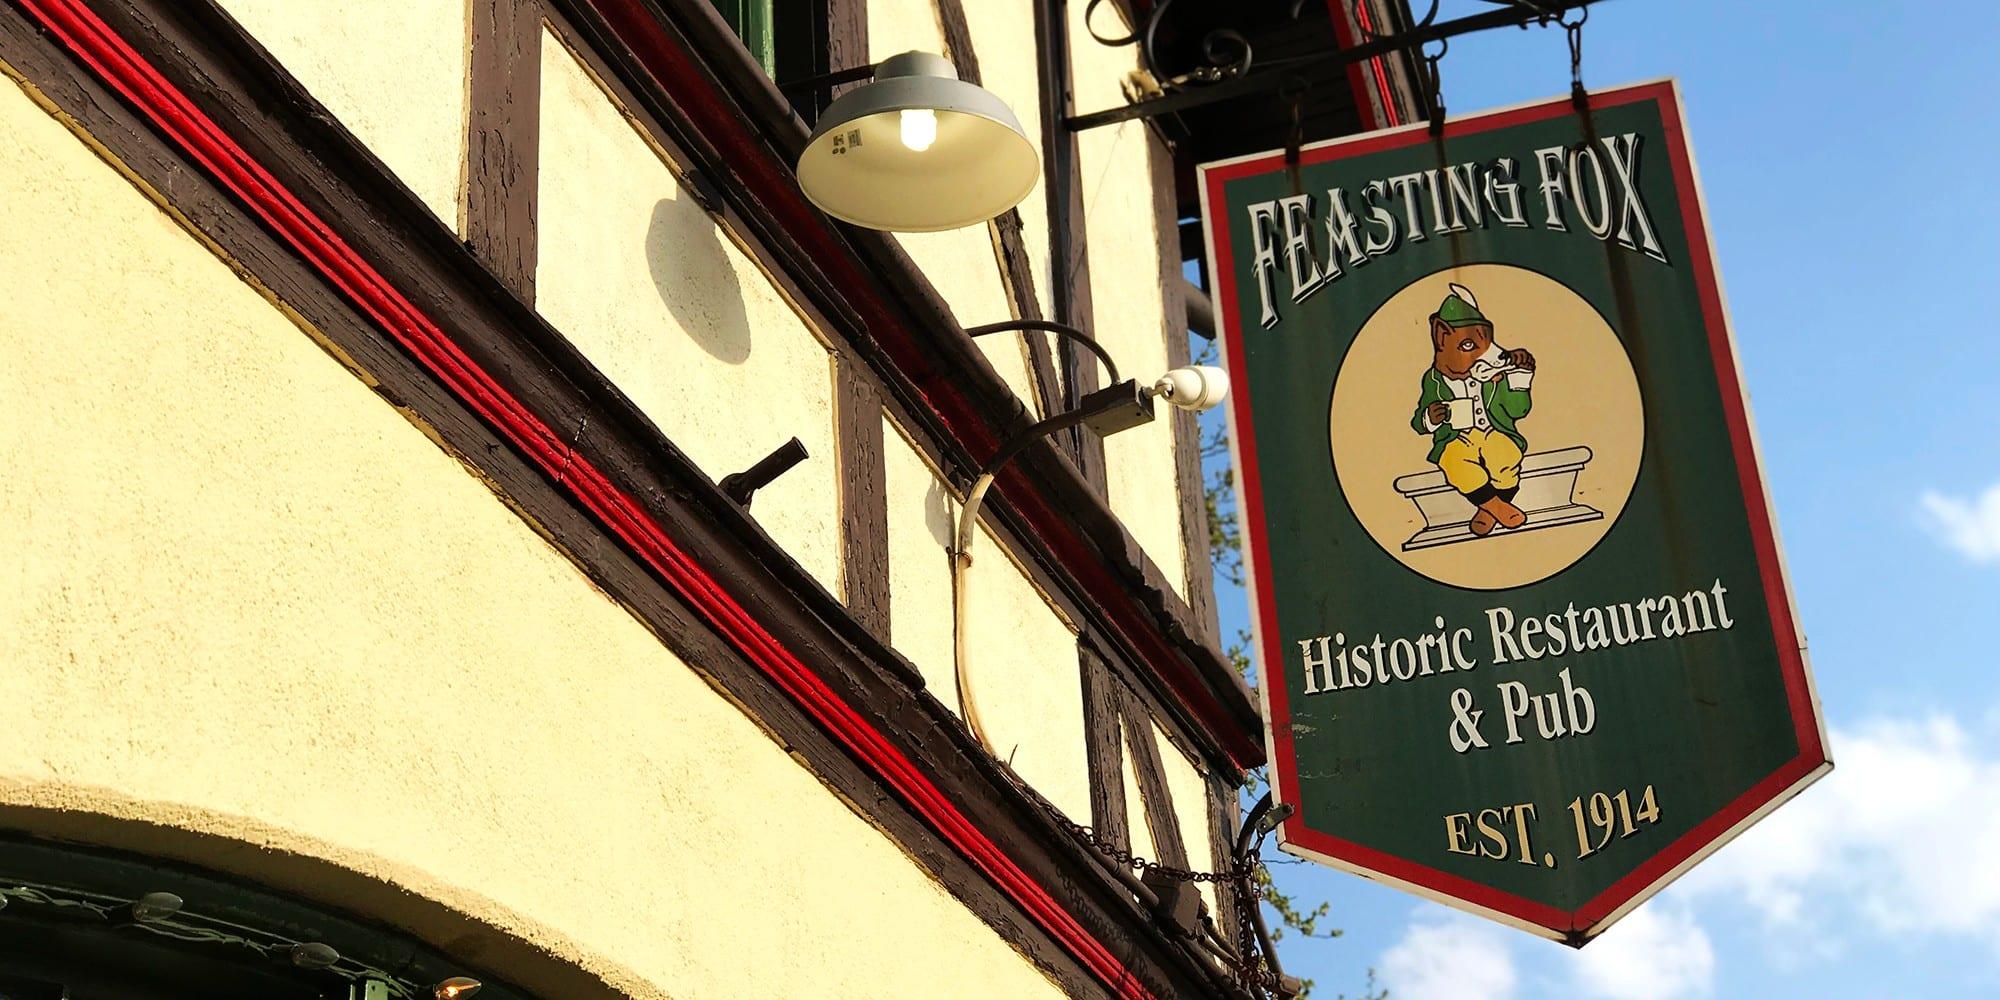 The Feasting Fox Historic Restaurant and Pub.